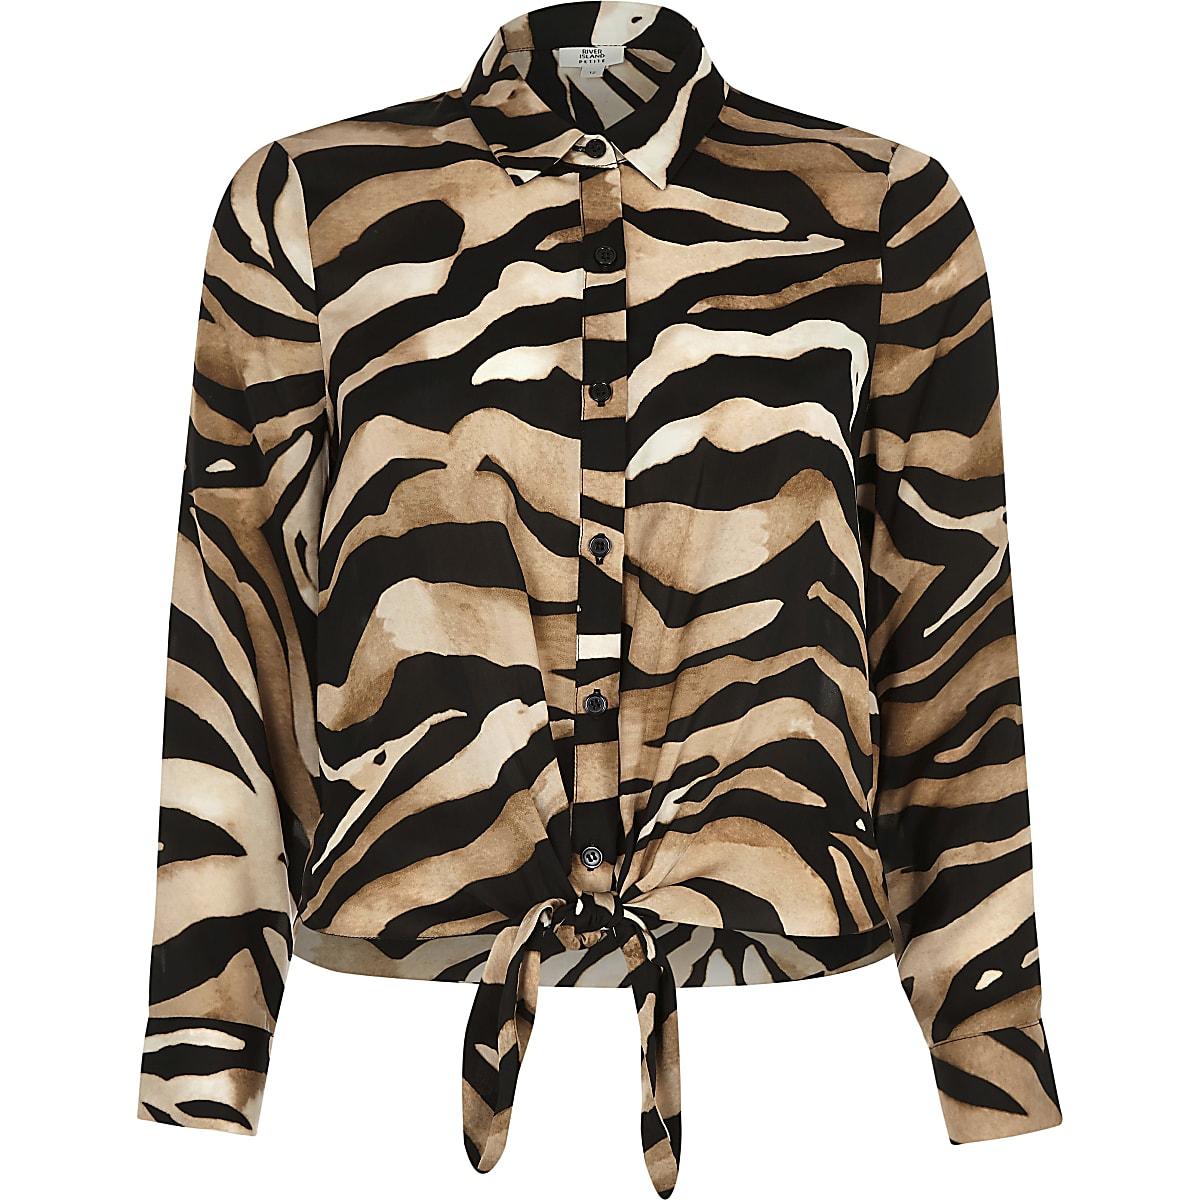 Bruin Overhemd.Ri Petite Bruin Overhemd Met Zebraprint En Knopen Overhemden